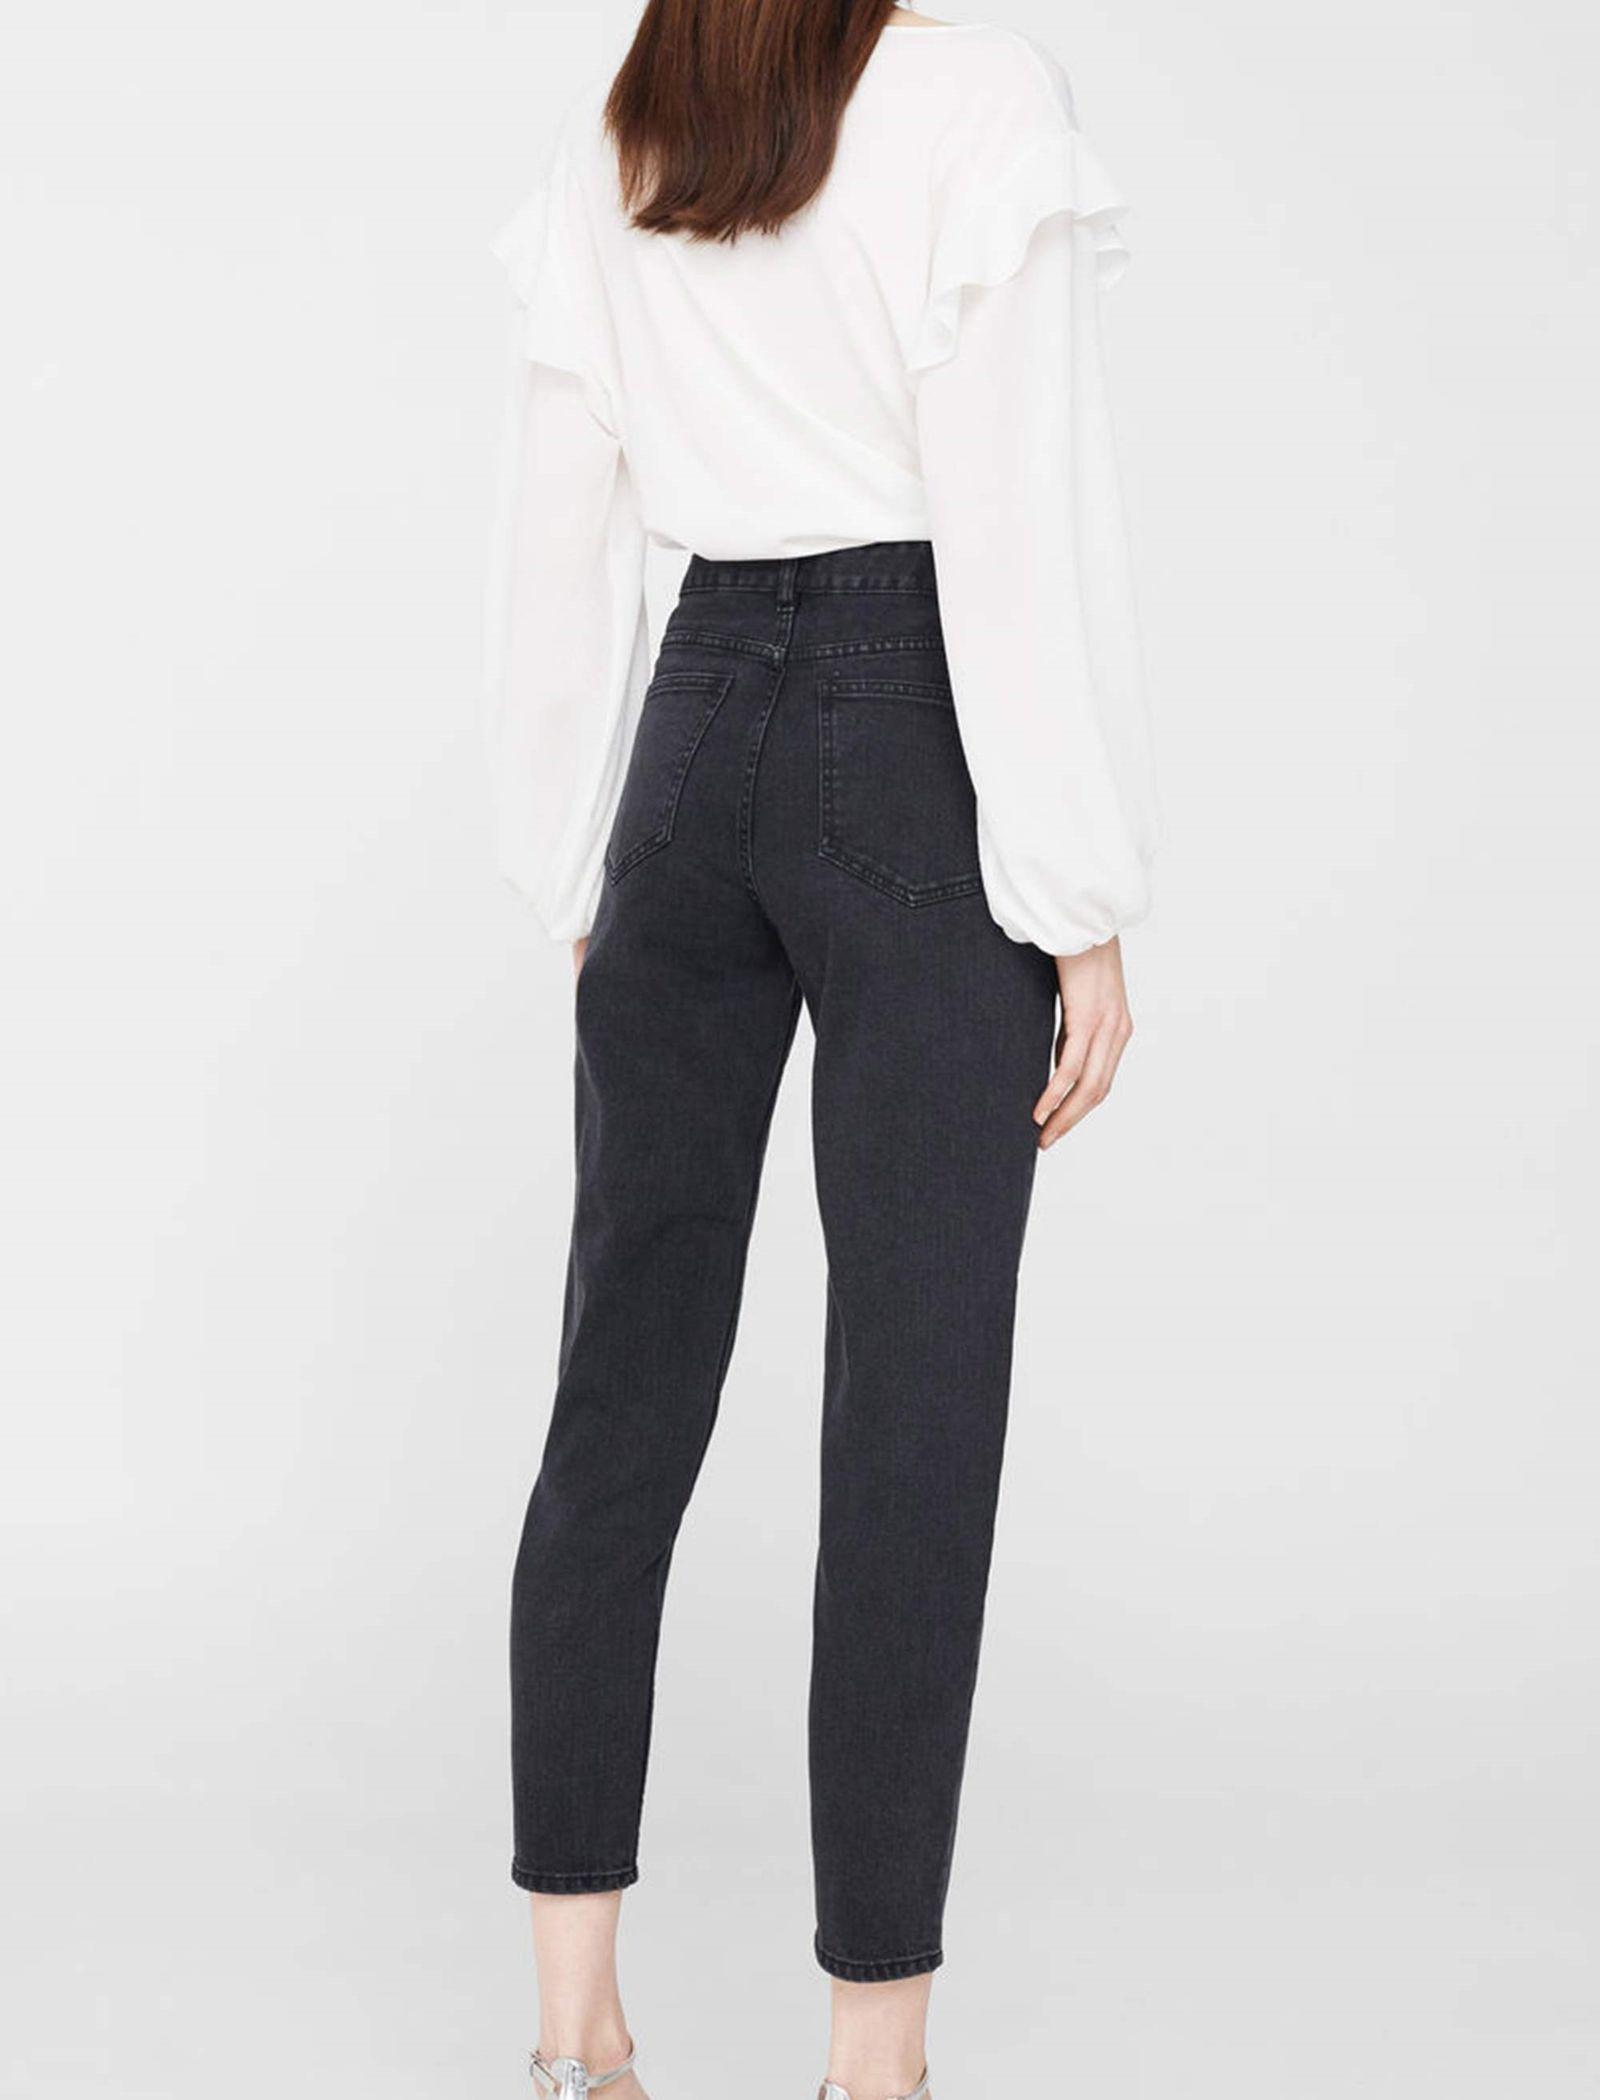 شلوار جین راسته زنانه - مانگو - زغالي - 3